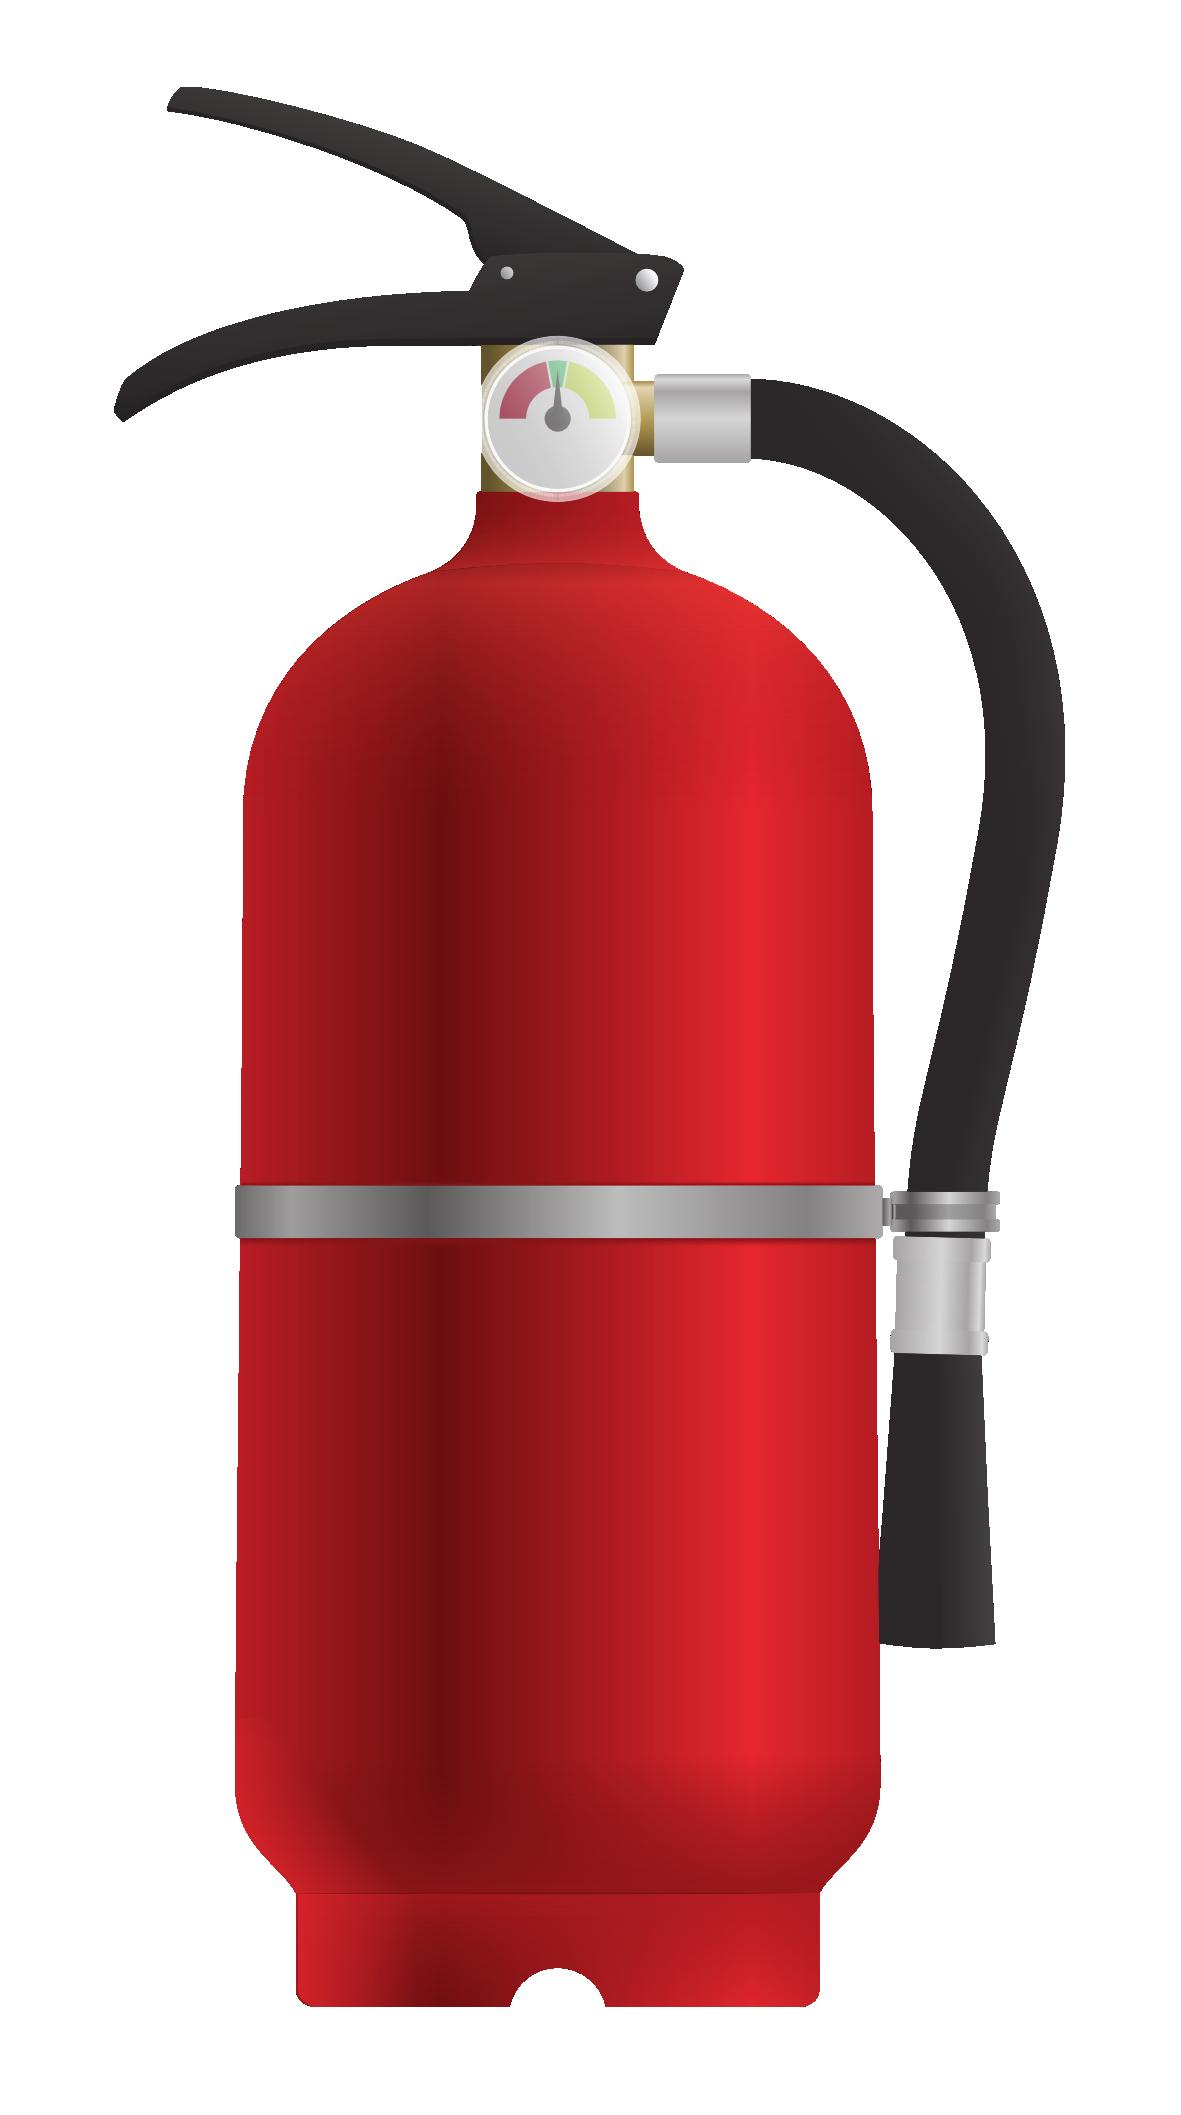 Extinguisher png image pngpix. Fire clipart vector